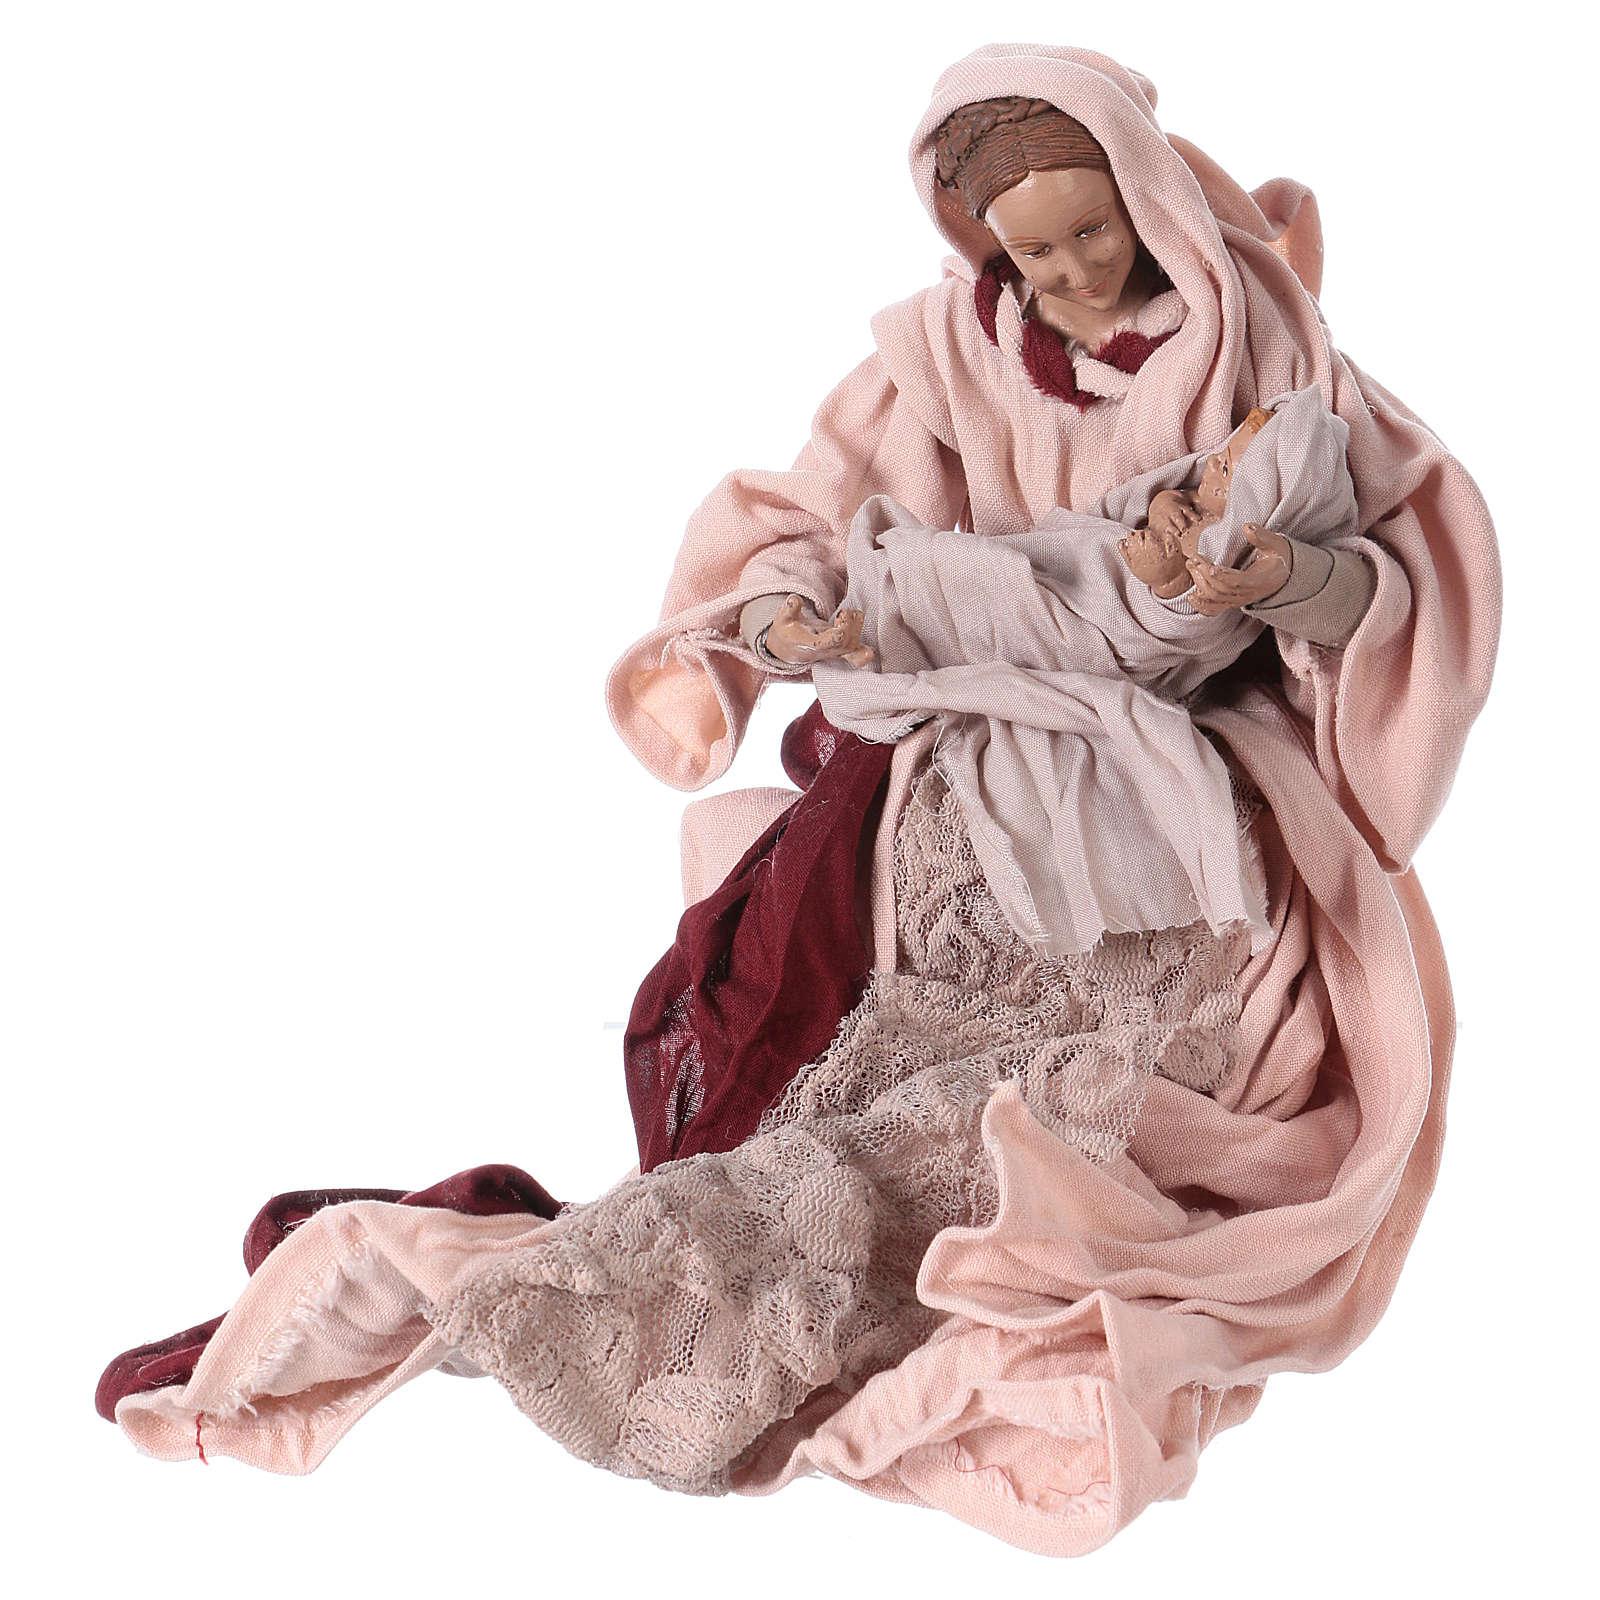 Nativity Scene 25 cm resin fabric pink burgundy 3